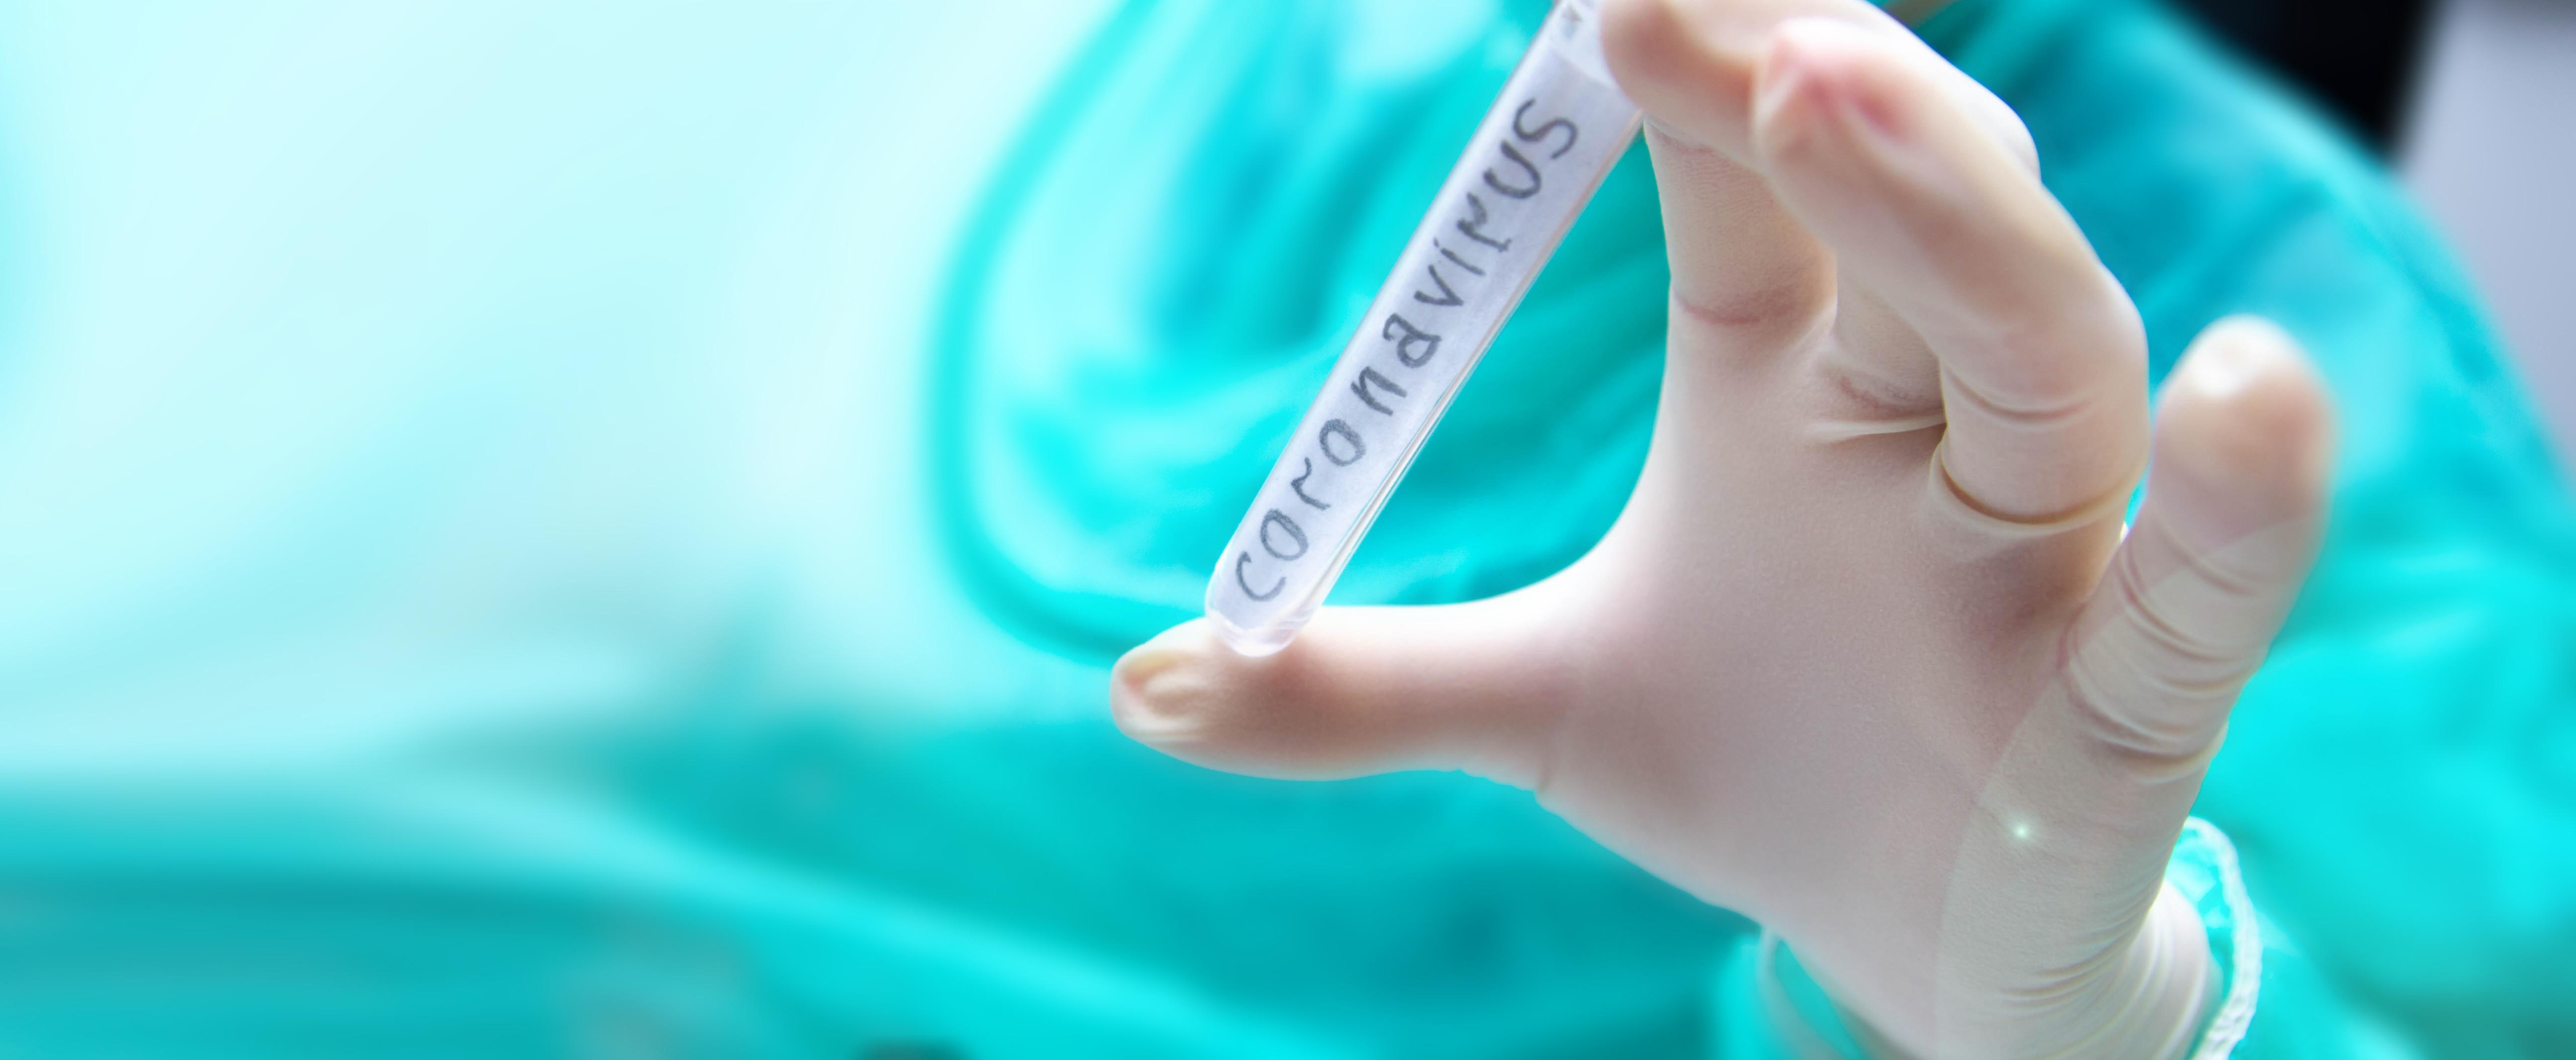 coronavirus test tube